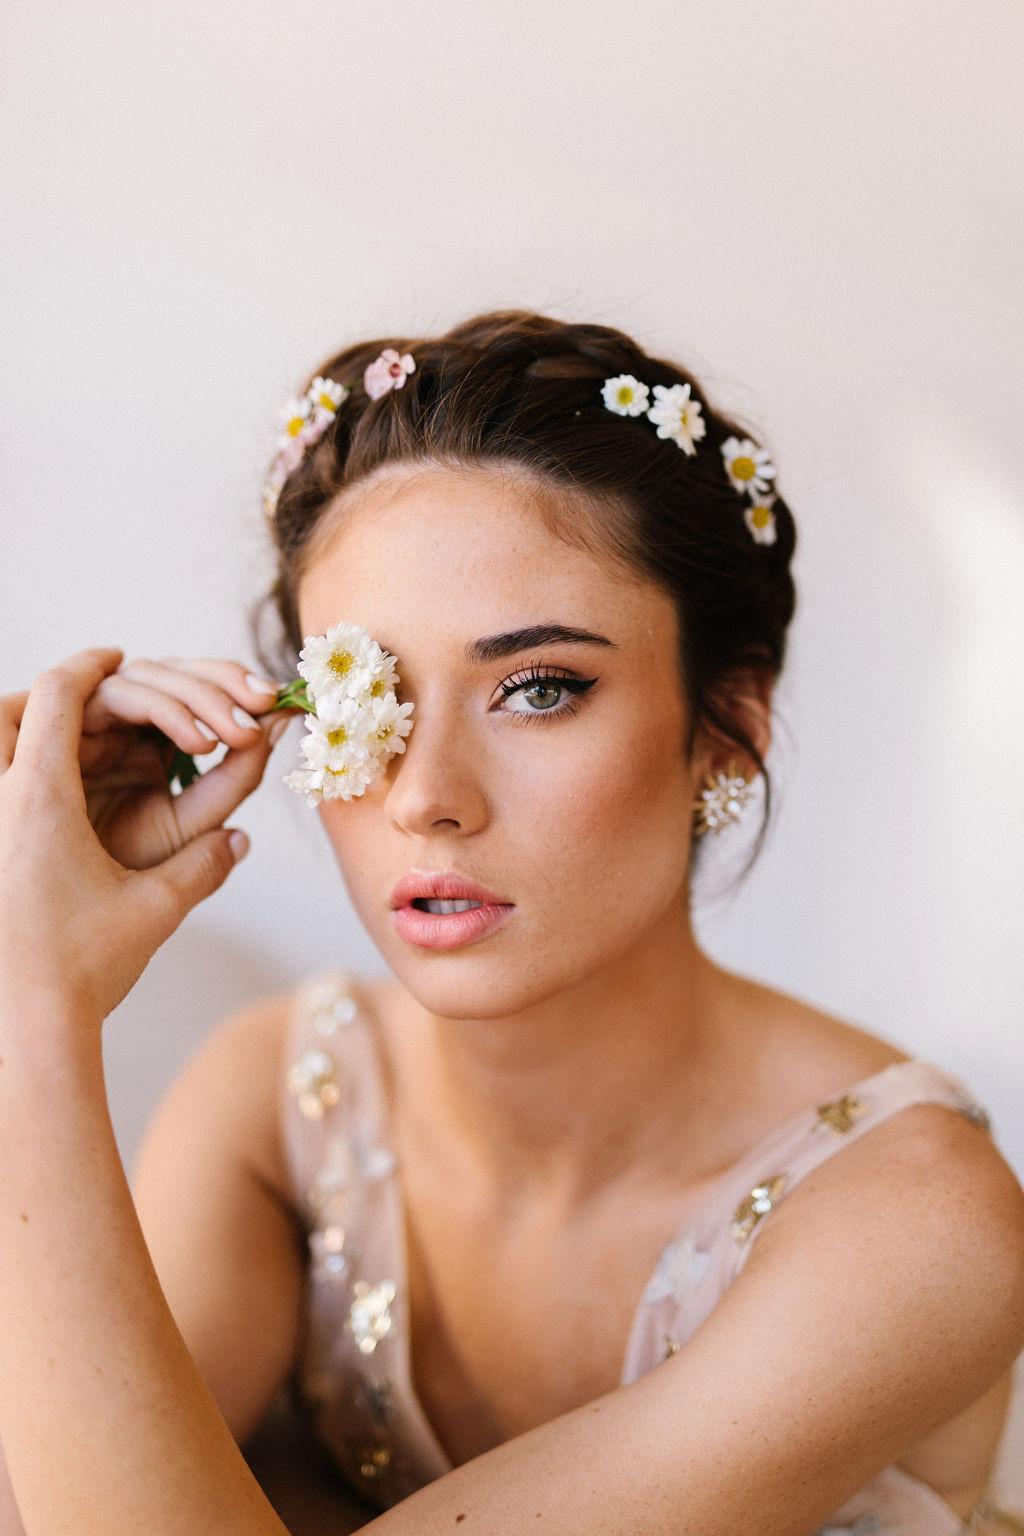 diy boho haircrown with flowers_01